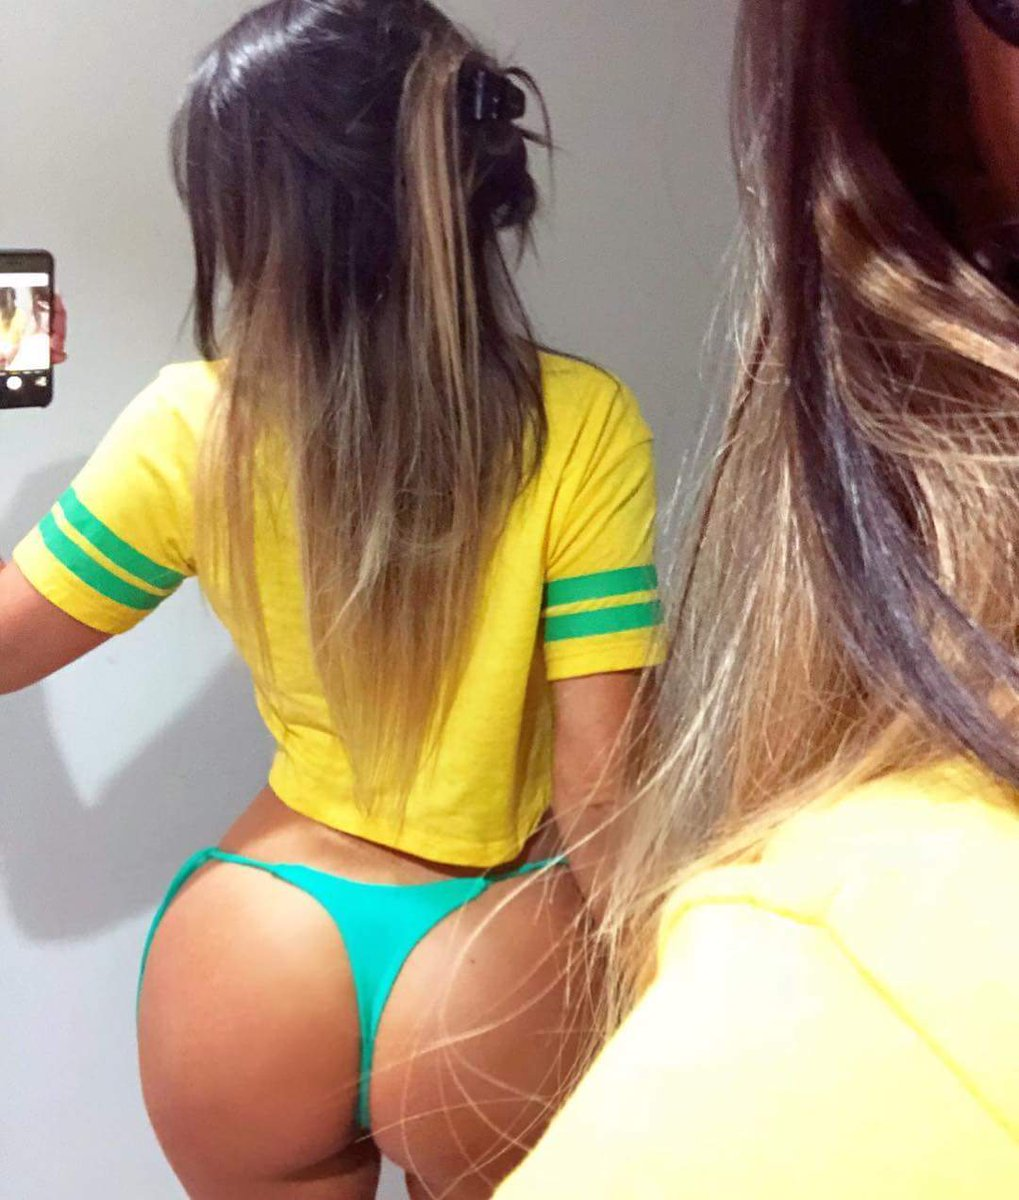 RT @Khris_Finiz: Tra Brasile - Svizzera ha vinto Lei https://t.co/yagDbzl06p